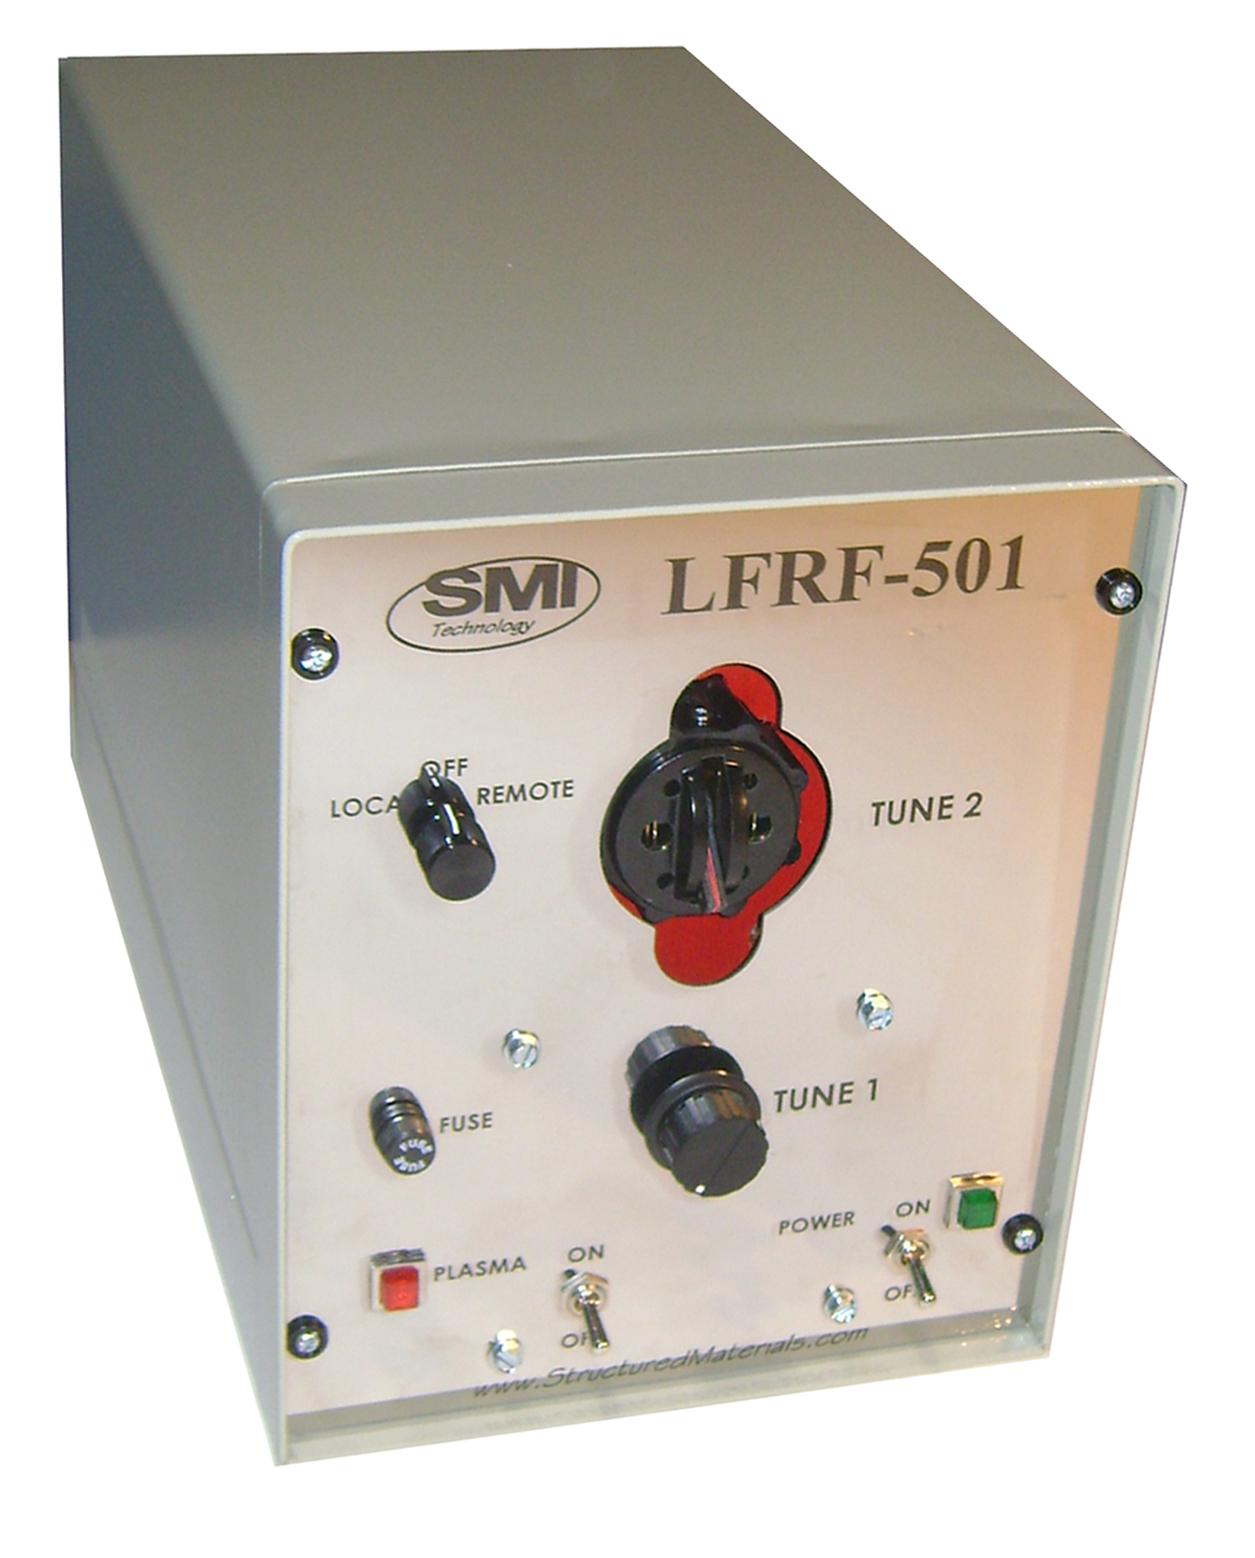 LFRF-501